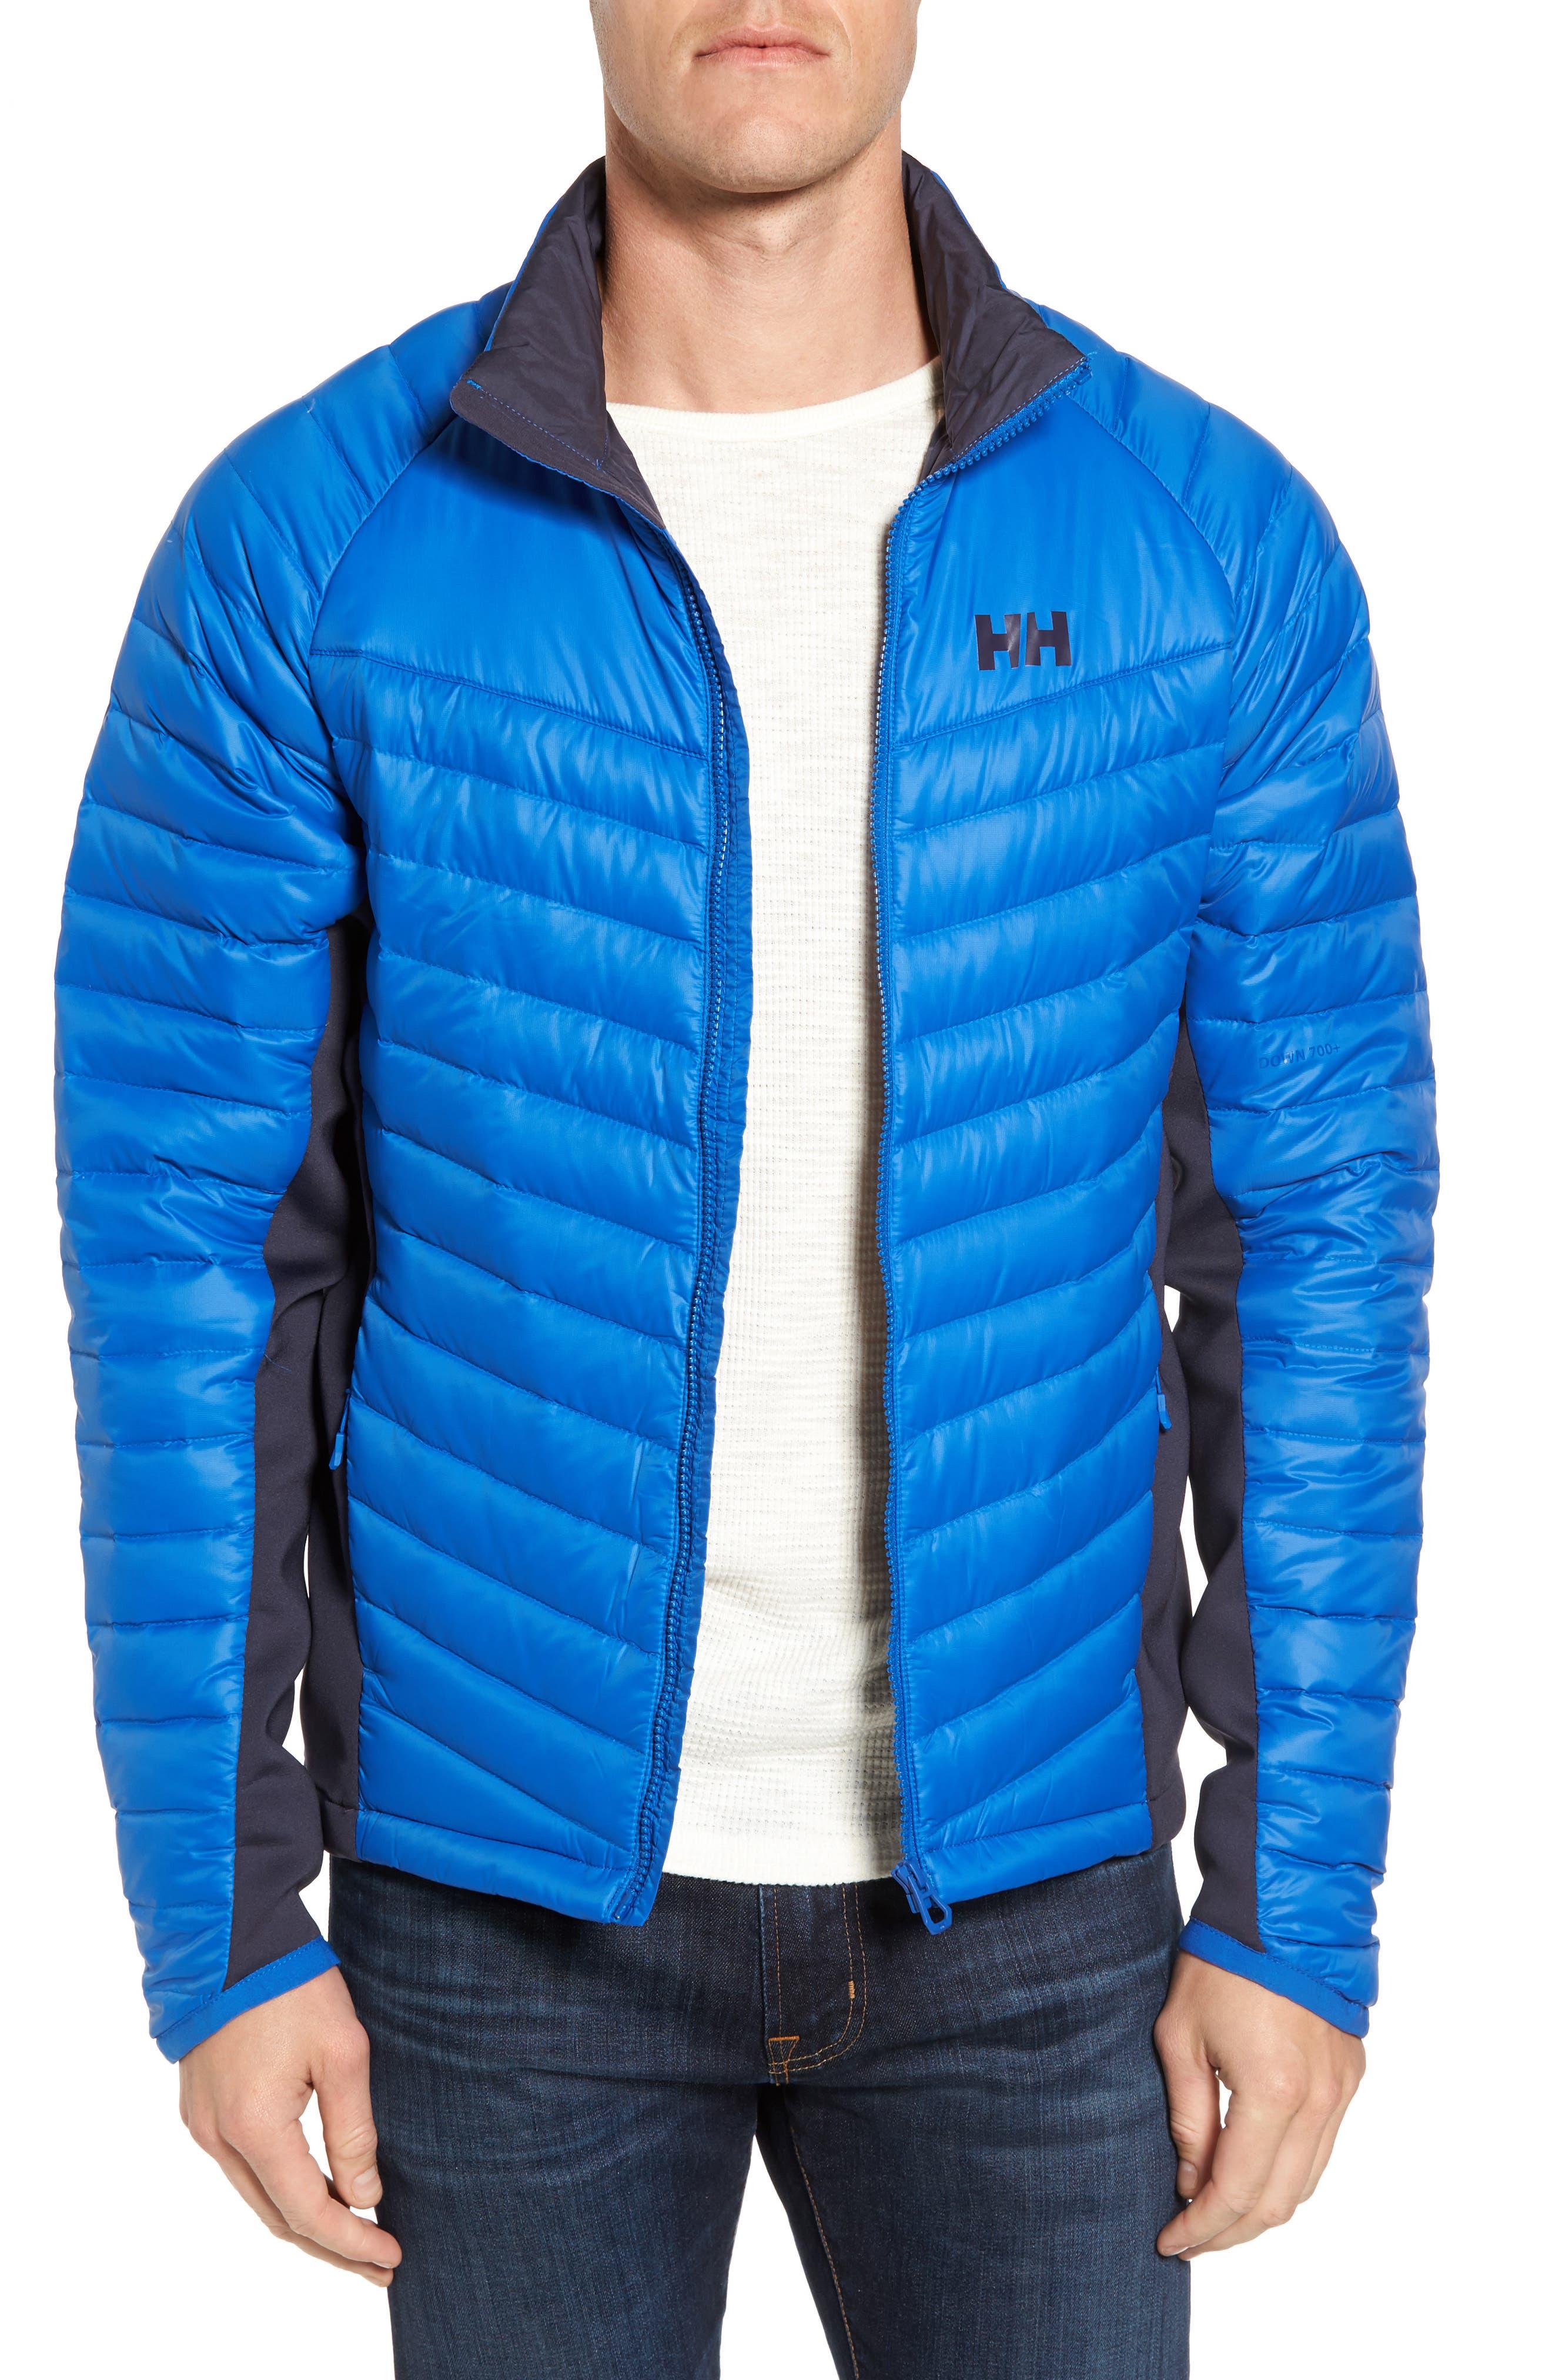 Verglas Insulator Hybrid Jacket,                         Main,                         color, 563 Olympian Blue